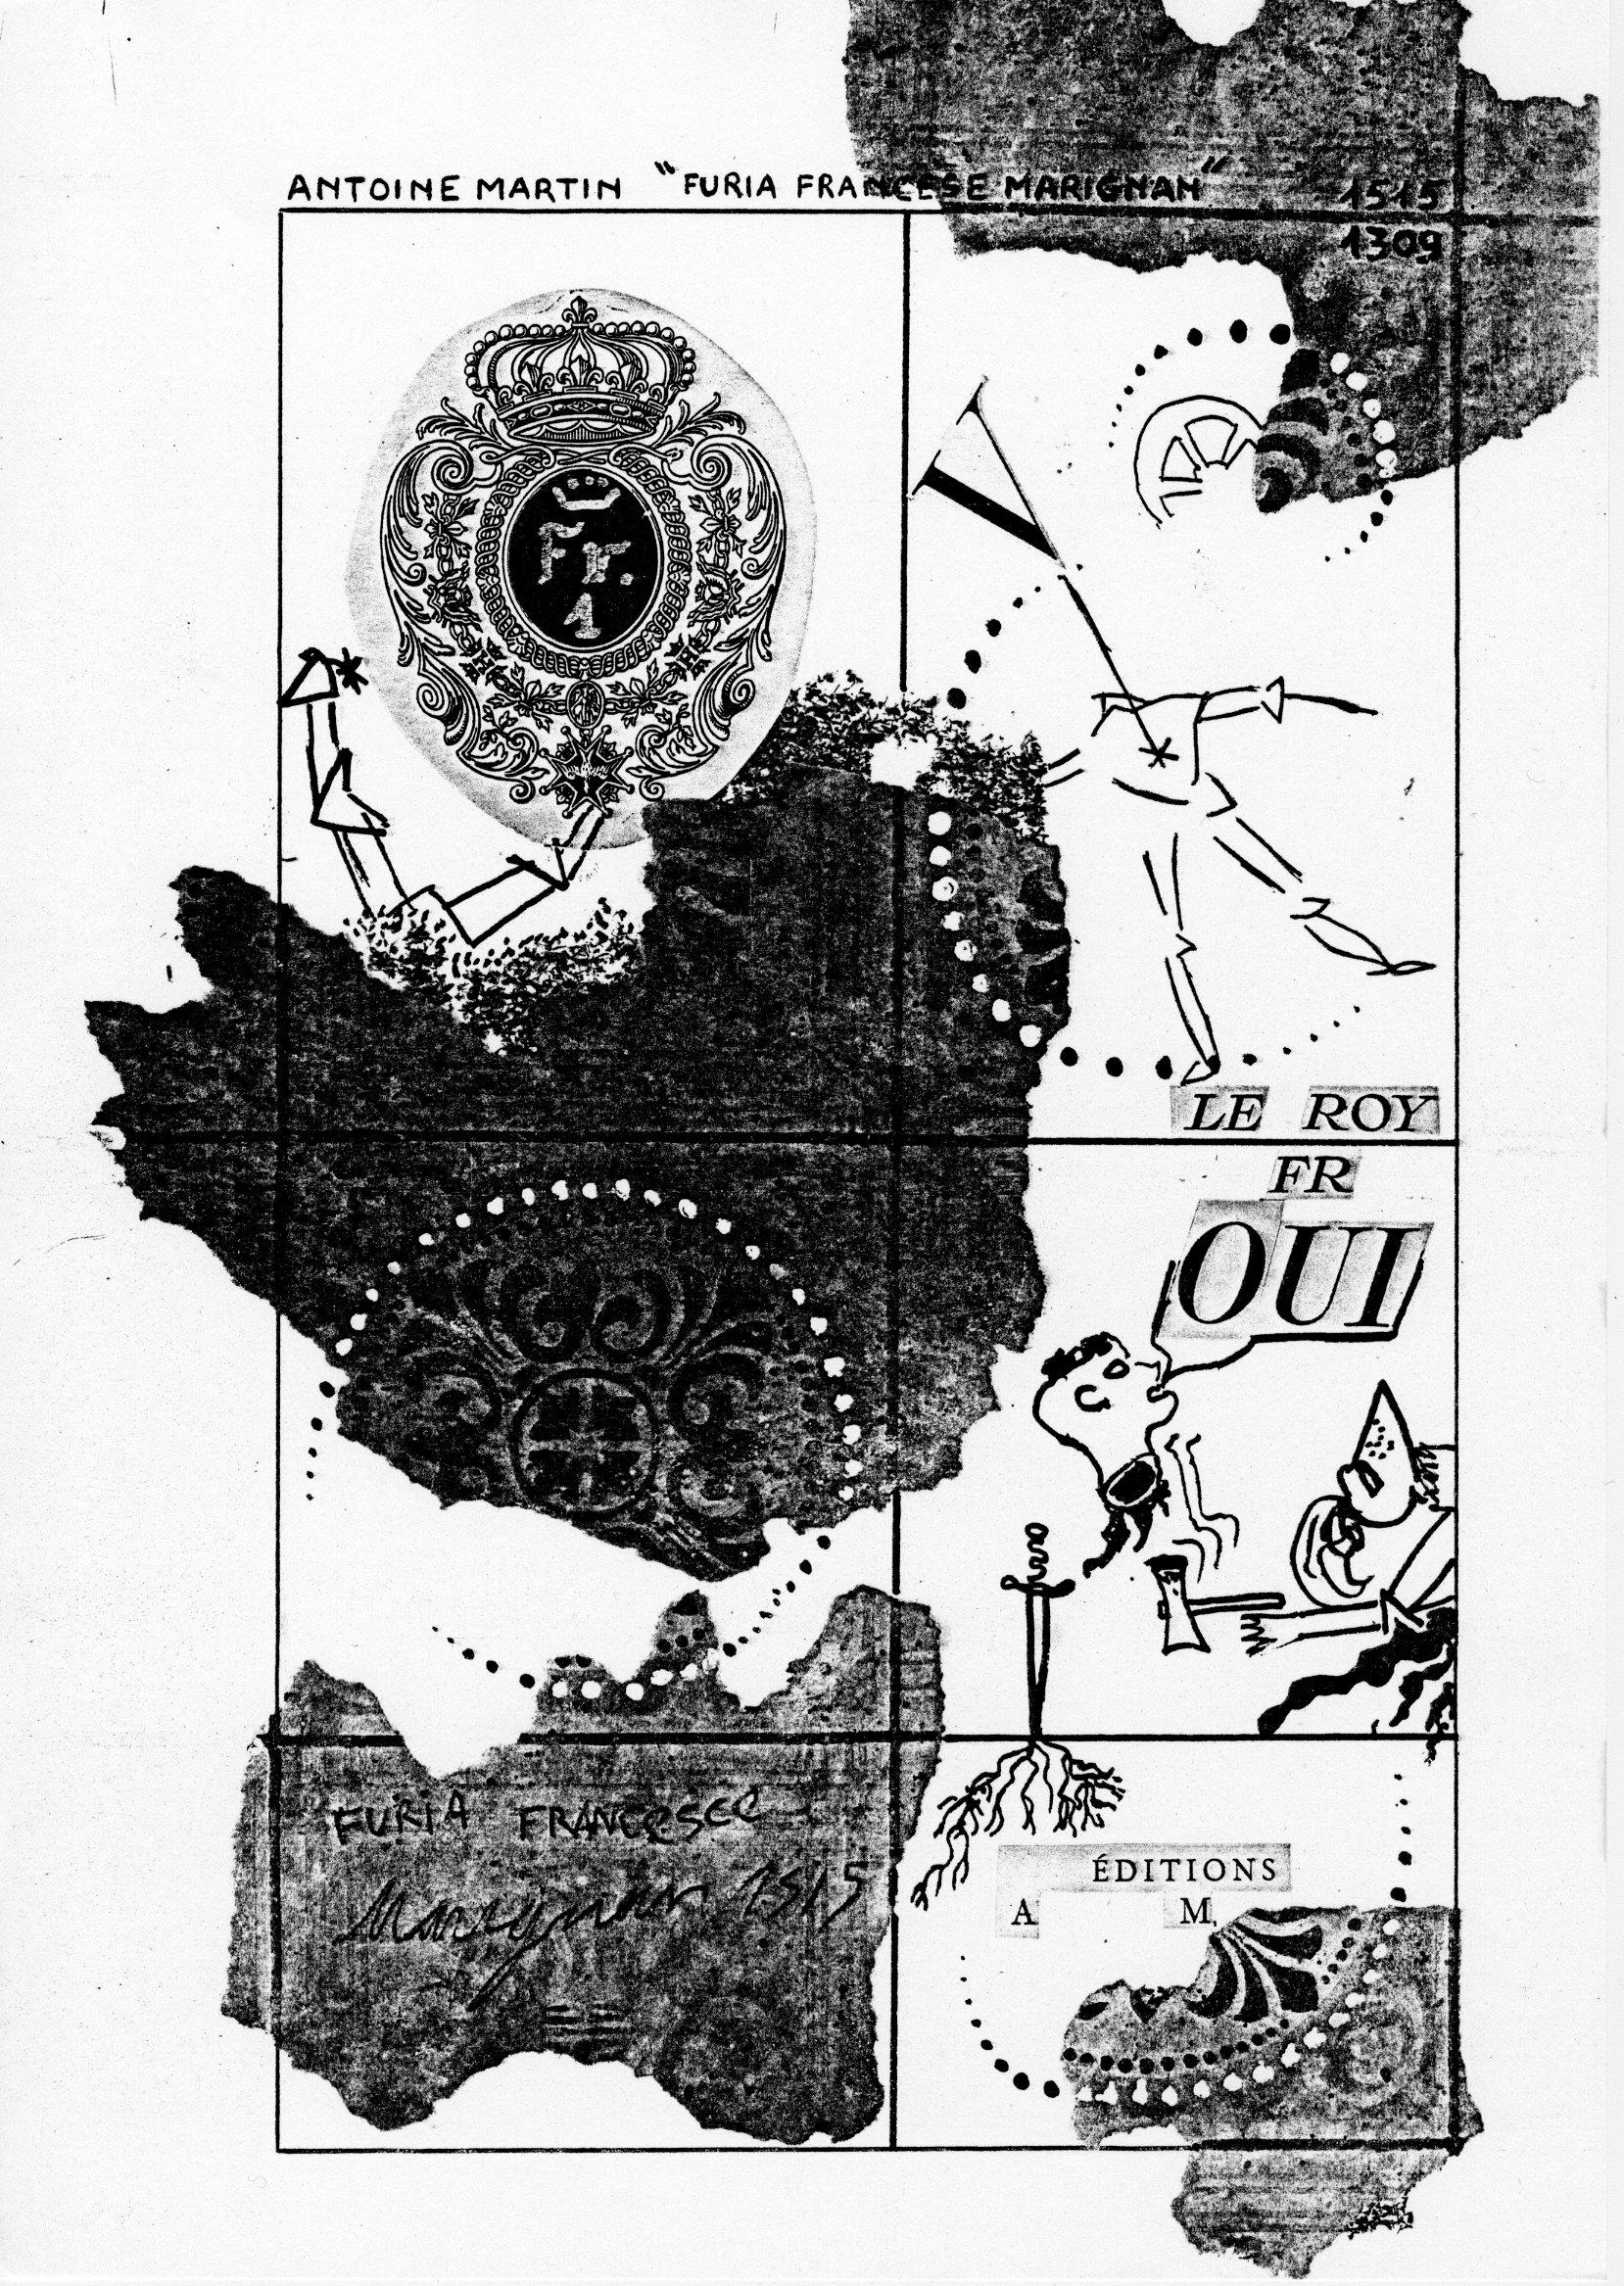 page 1309 A. Martin FURIA FRANCESE MARIGNAN